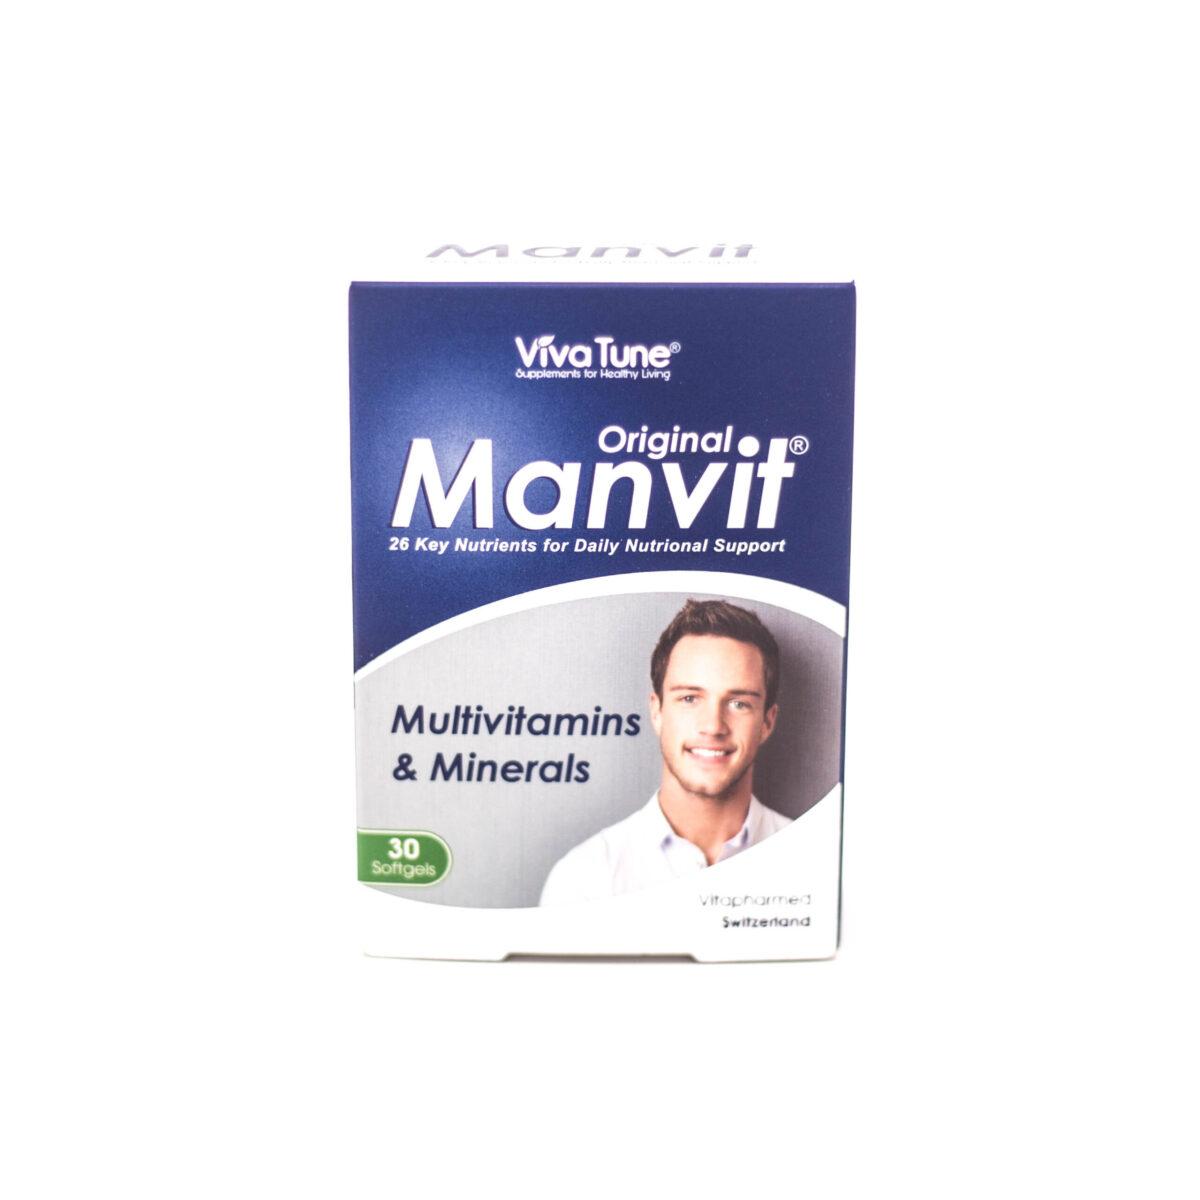 کپسول نرم ژلاتینی من ویت اوریجینال ویواتون VivaTune Manvit Original